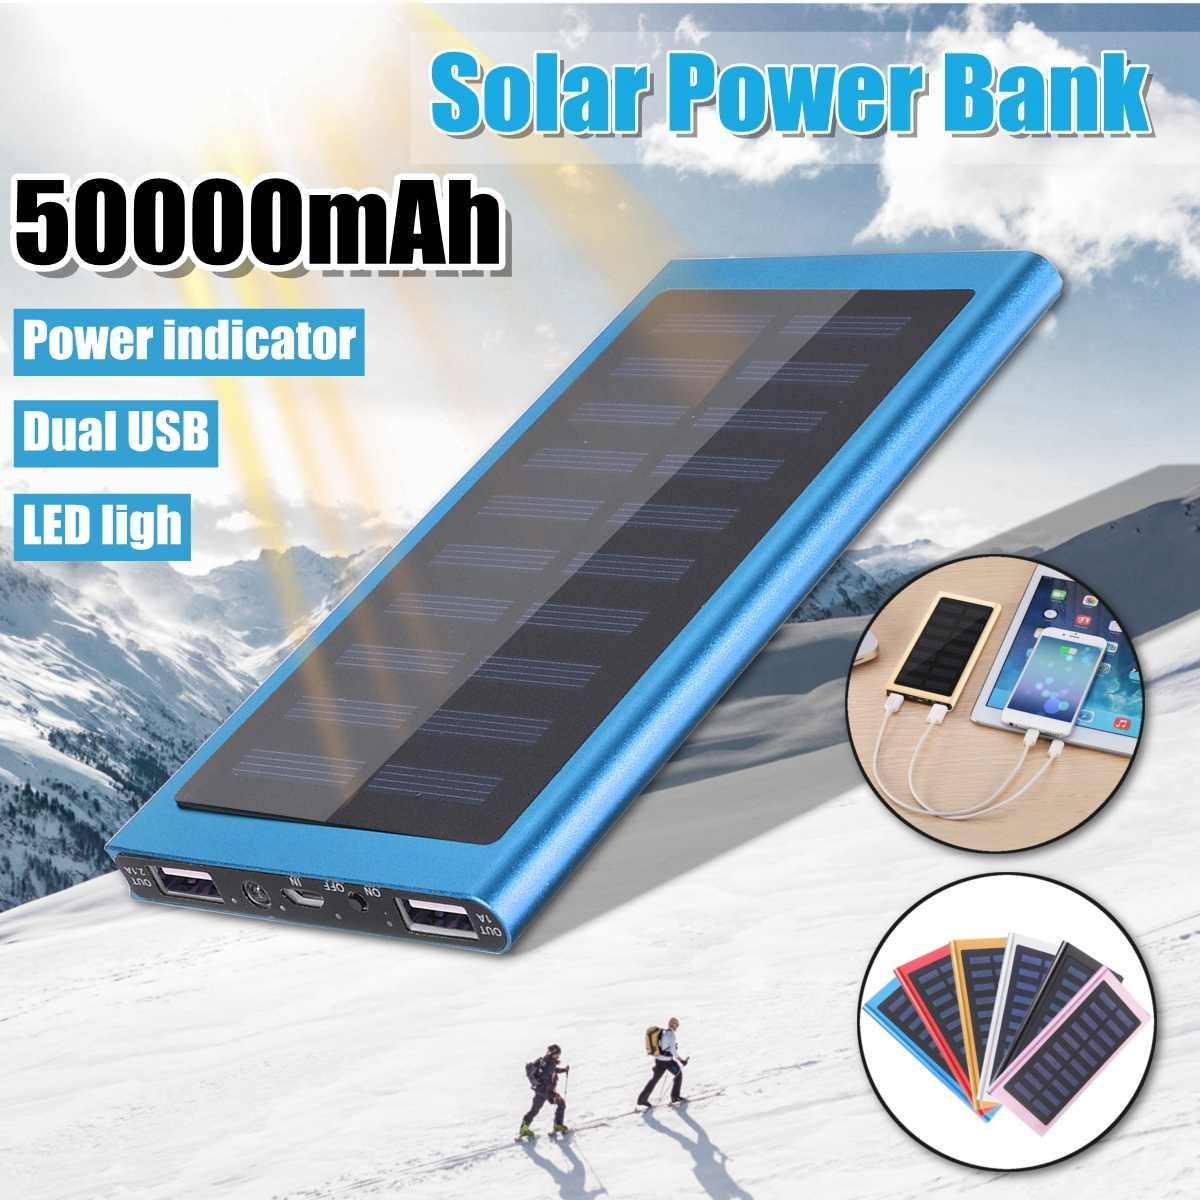 Hot Solar Power Bank 50000mah External Battery 2 USB LED Powerbank Portable Mobile Phone Solar Charger For Xiaomi Huawei Vivo